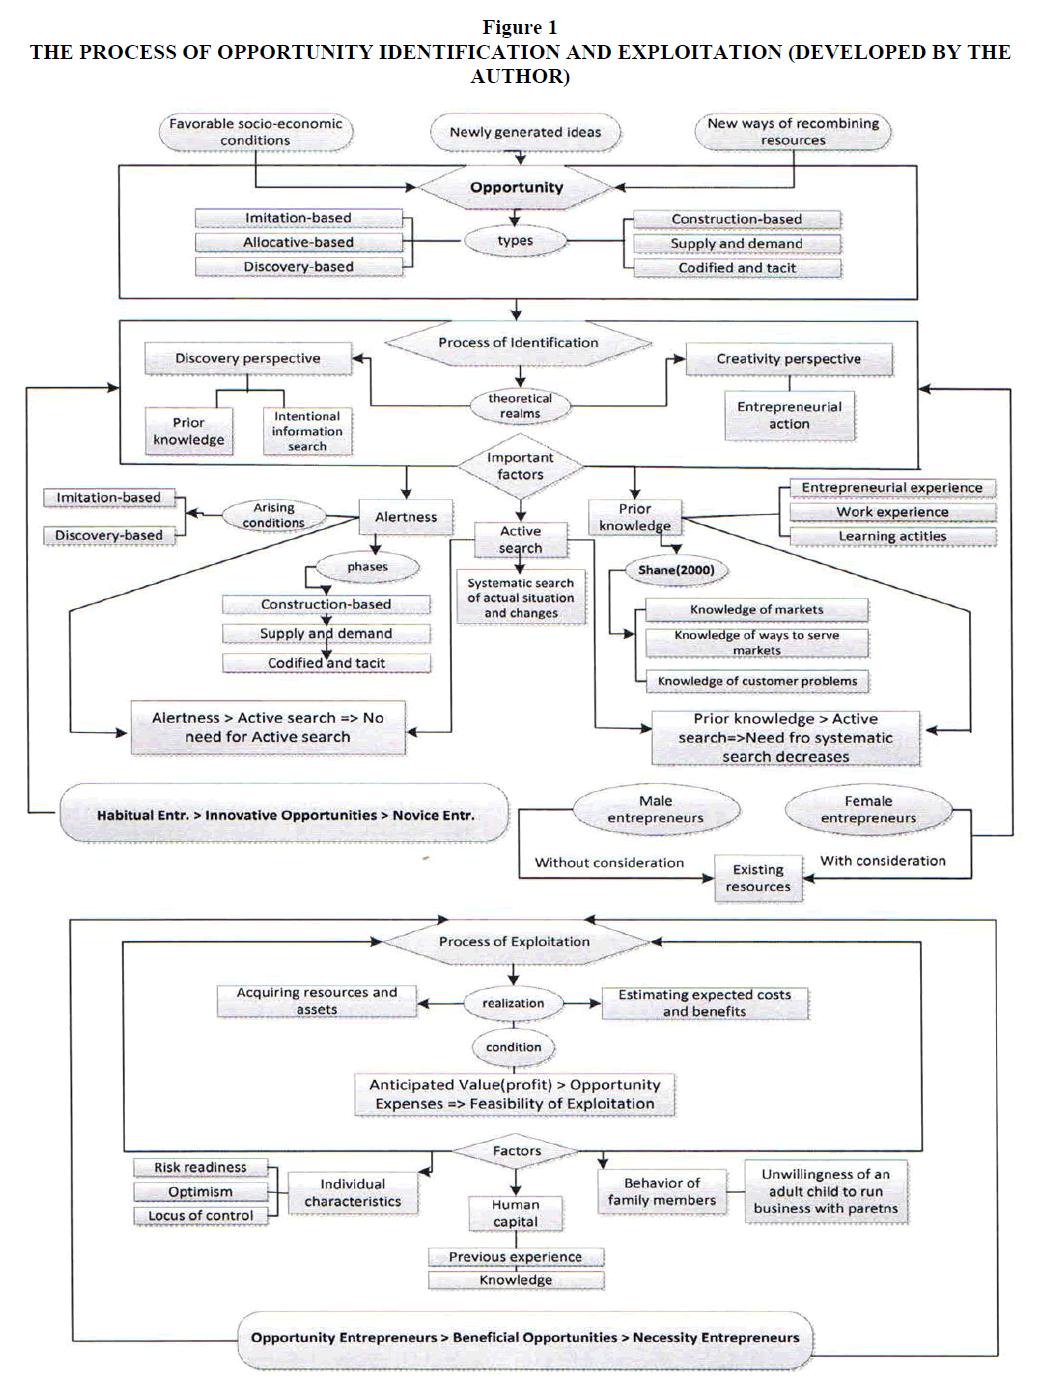 academy-entrepreneurship-Identification-Exploitation